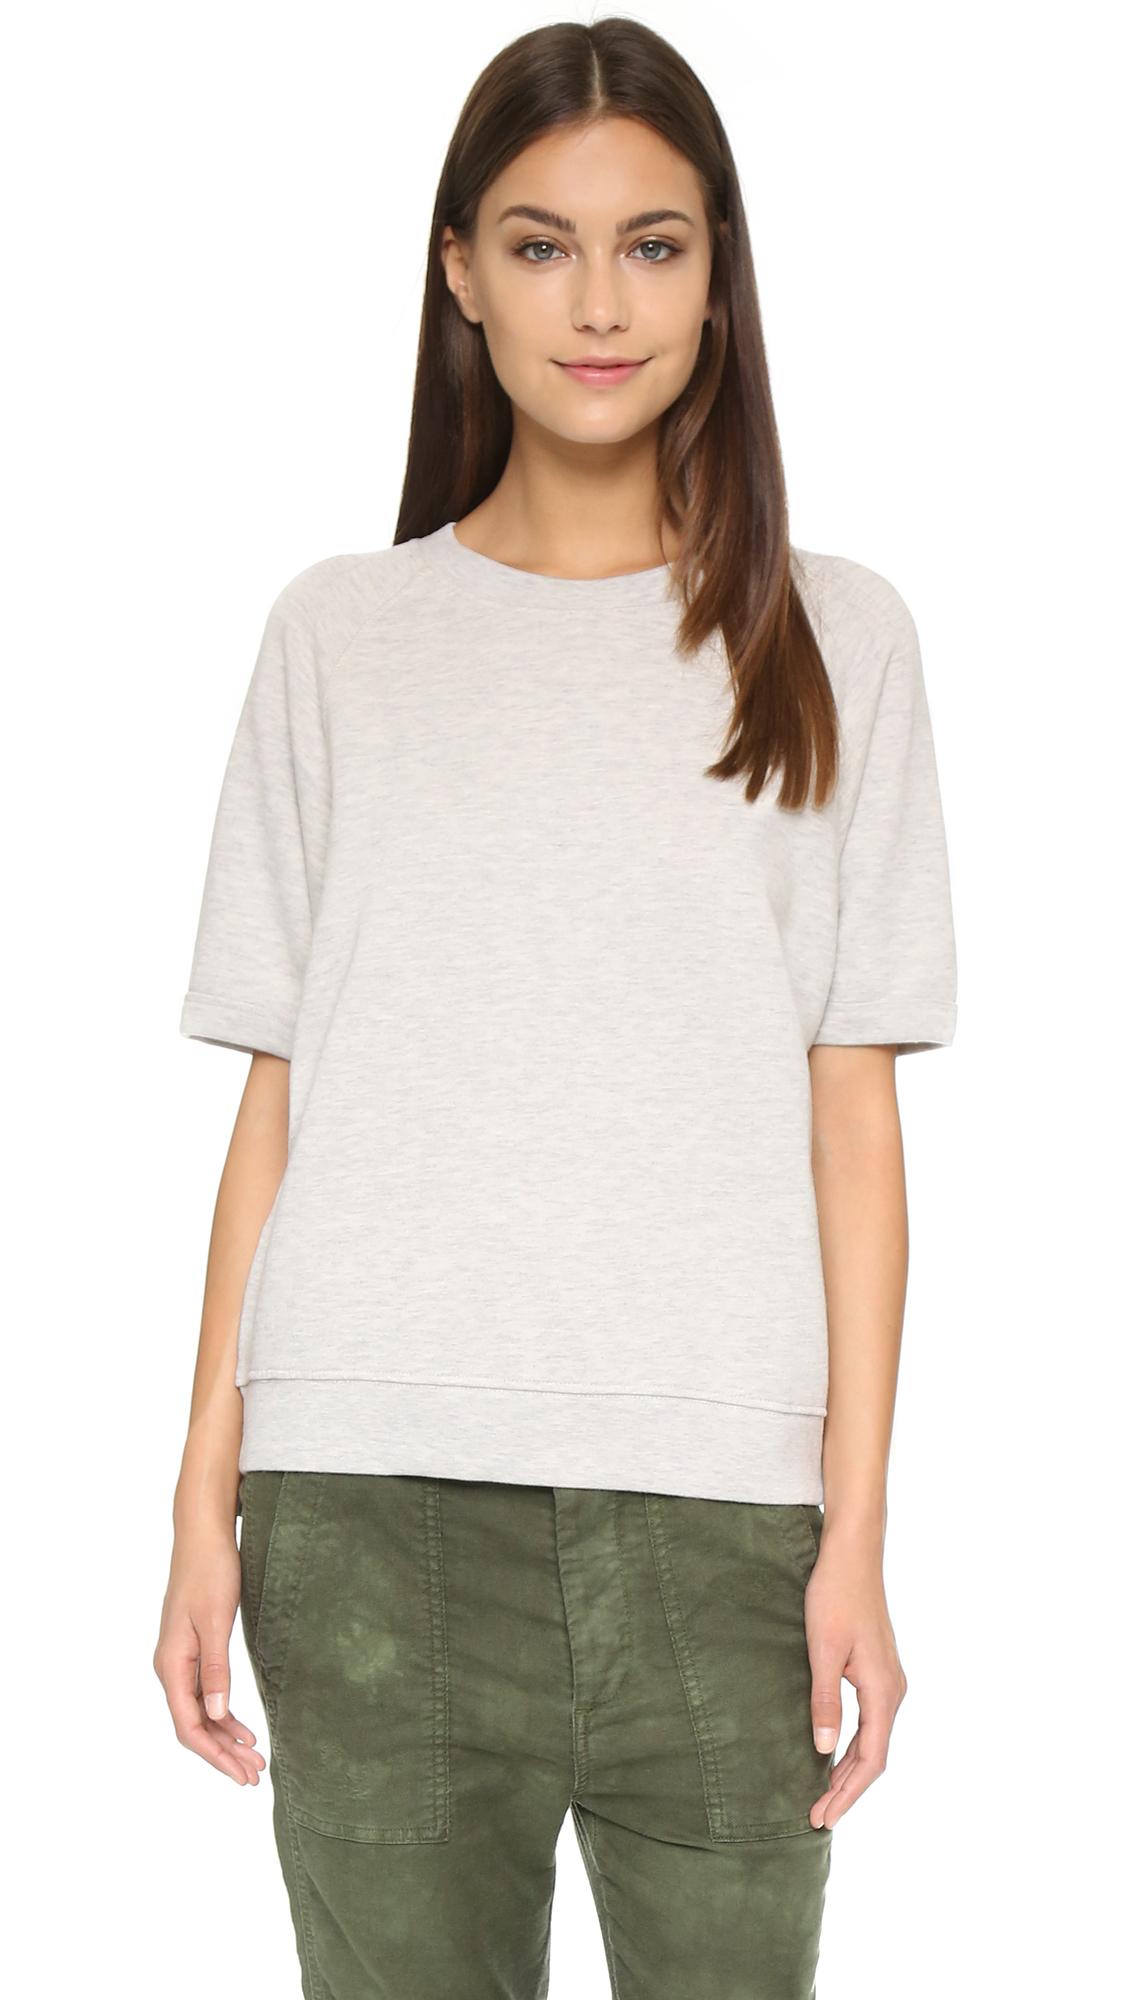 f5ec5d4bda40c Sincerely Jules Cara Short Sleeve Sweatshirt in White - Lyst